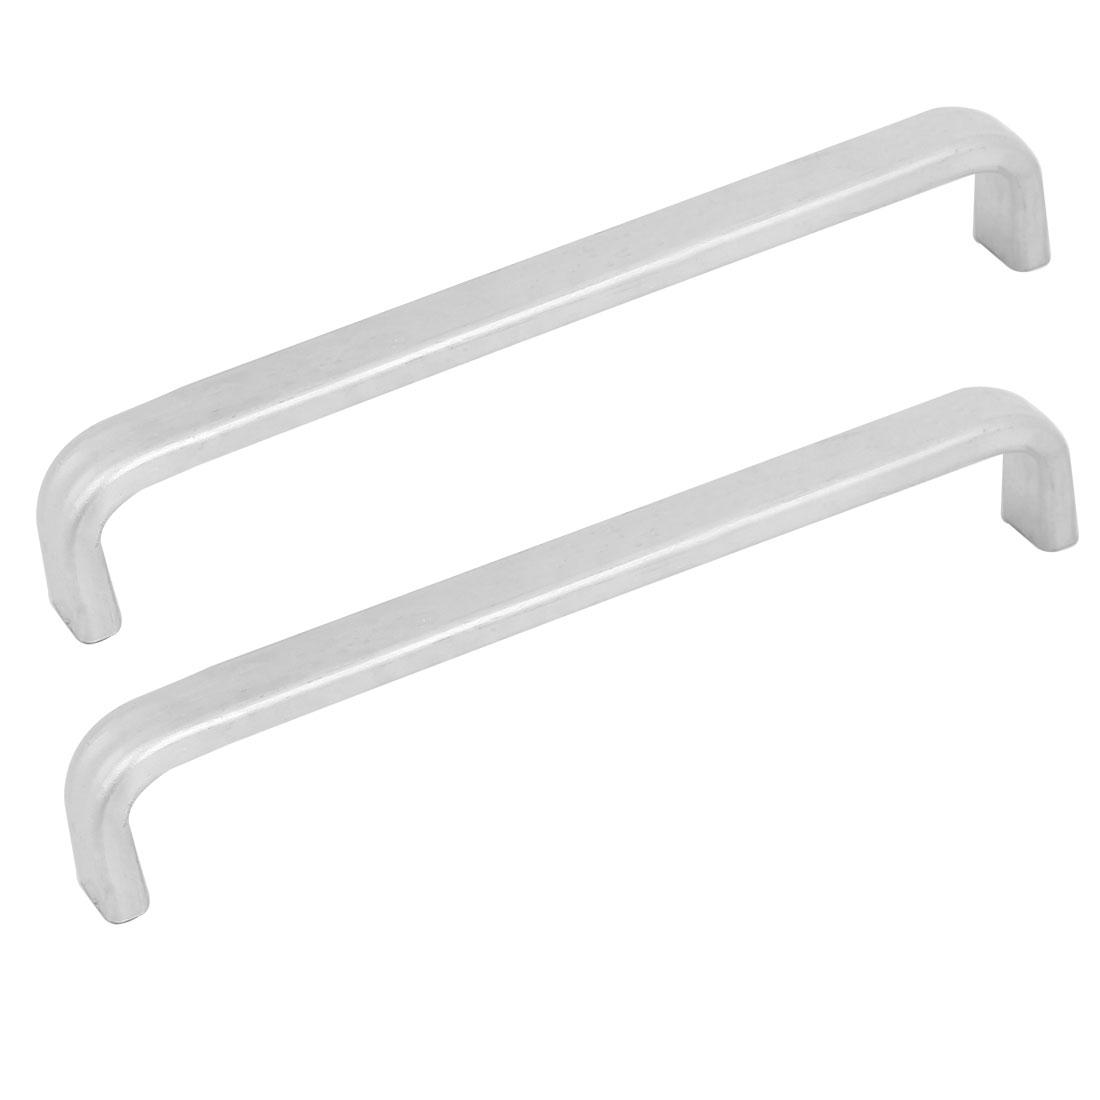 Cupboard Kitchen Aluminum Alloy Pull Handles Handware Tool 2pcs